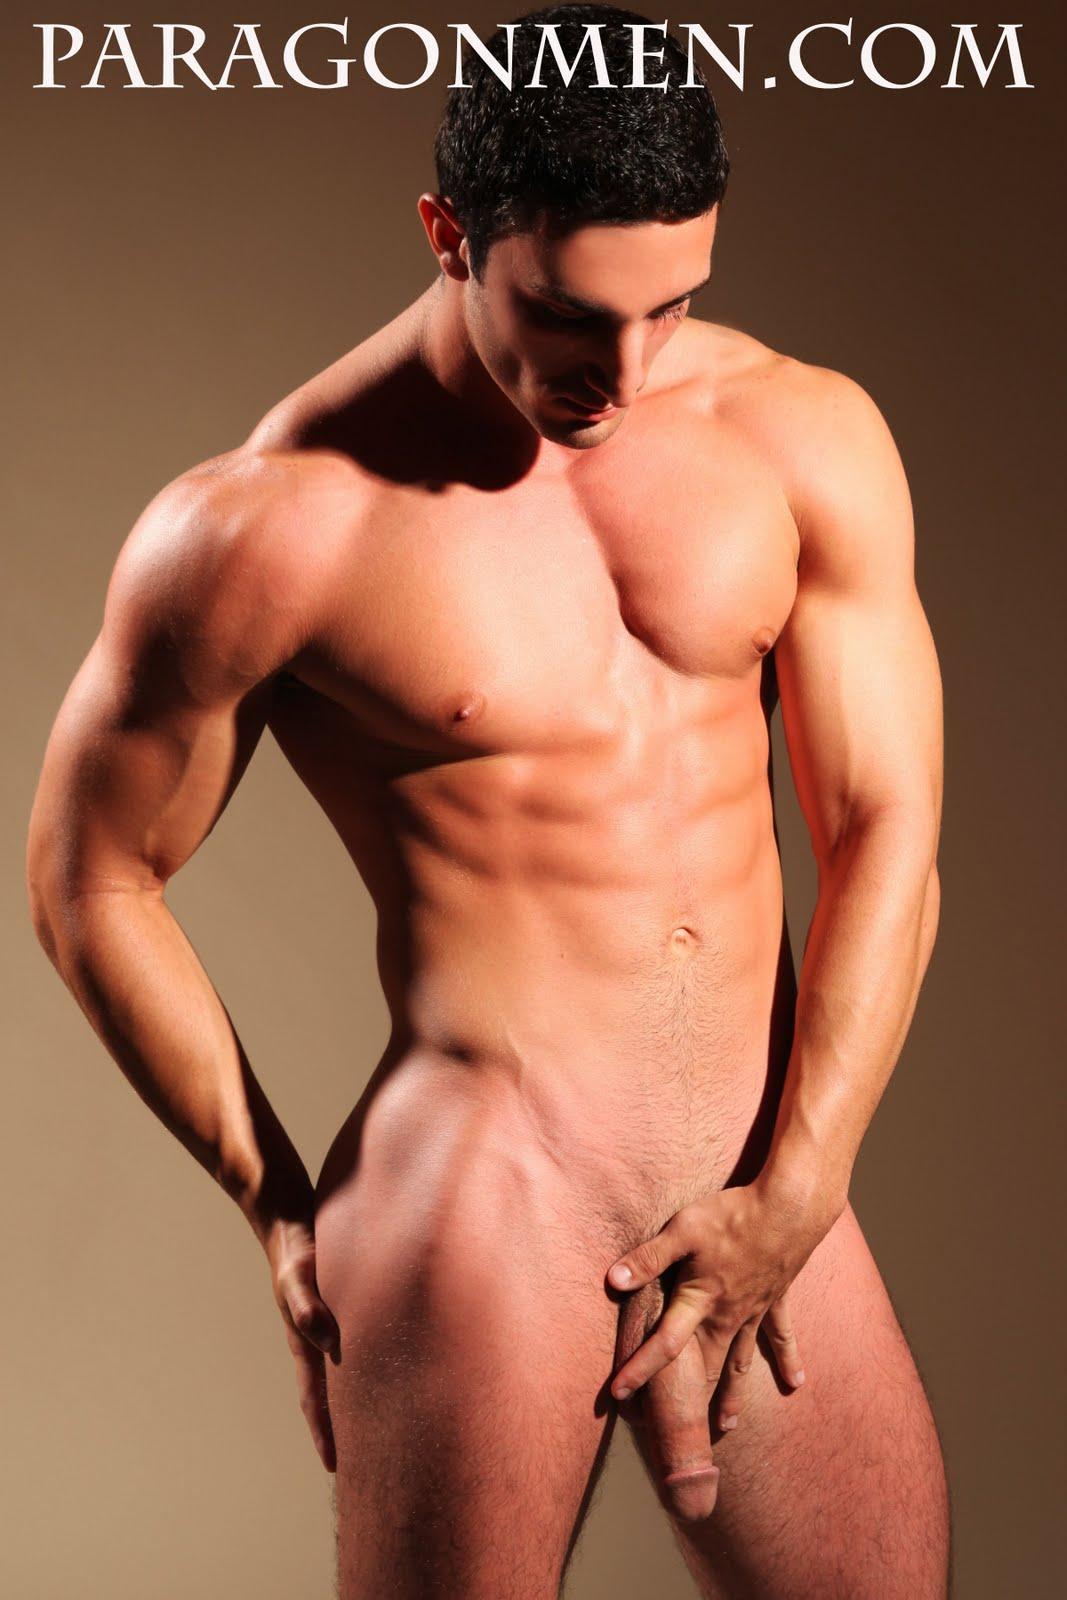 from Jakob gay crotch shots